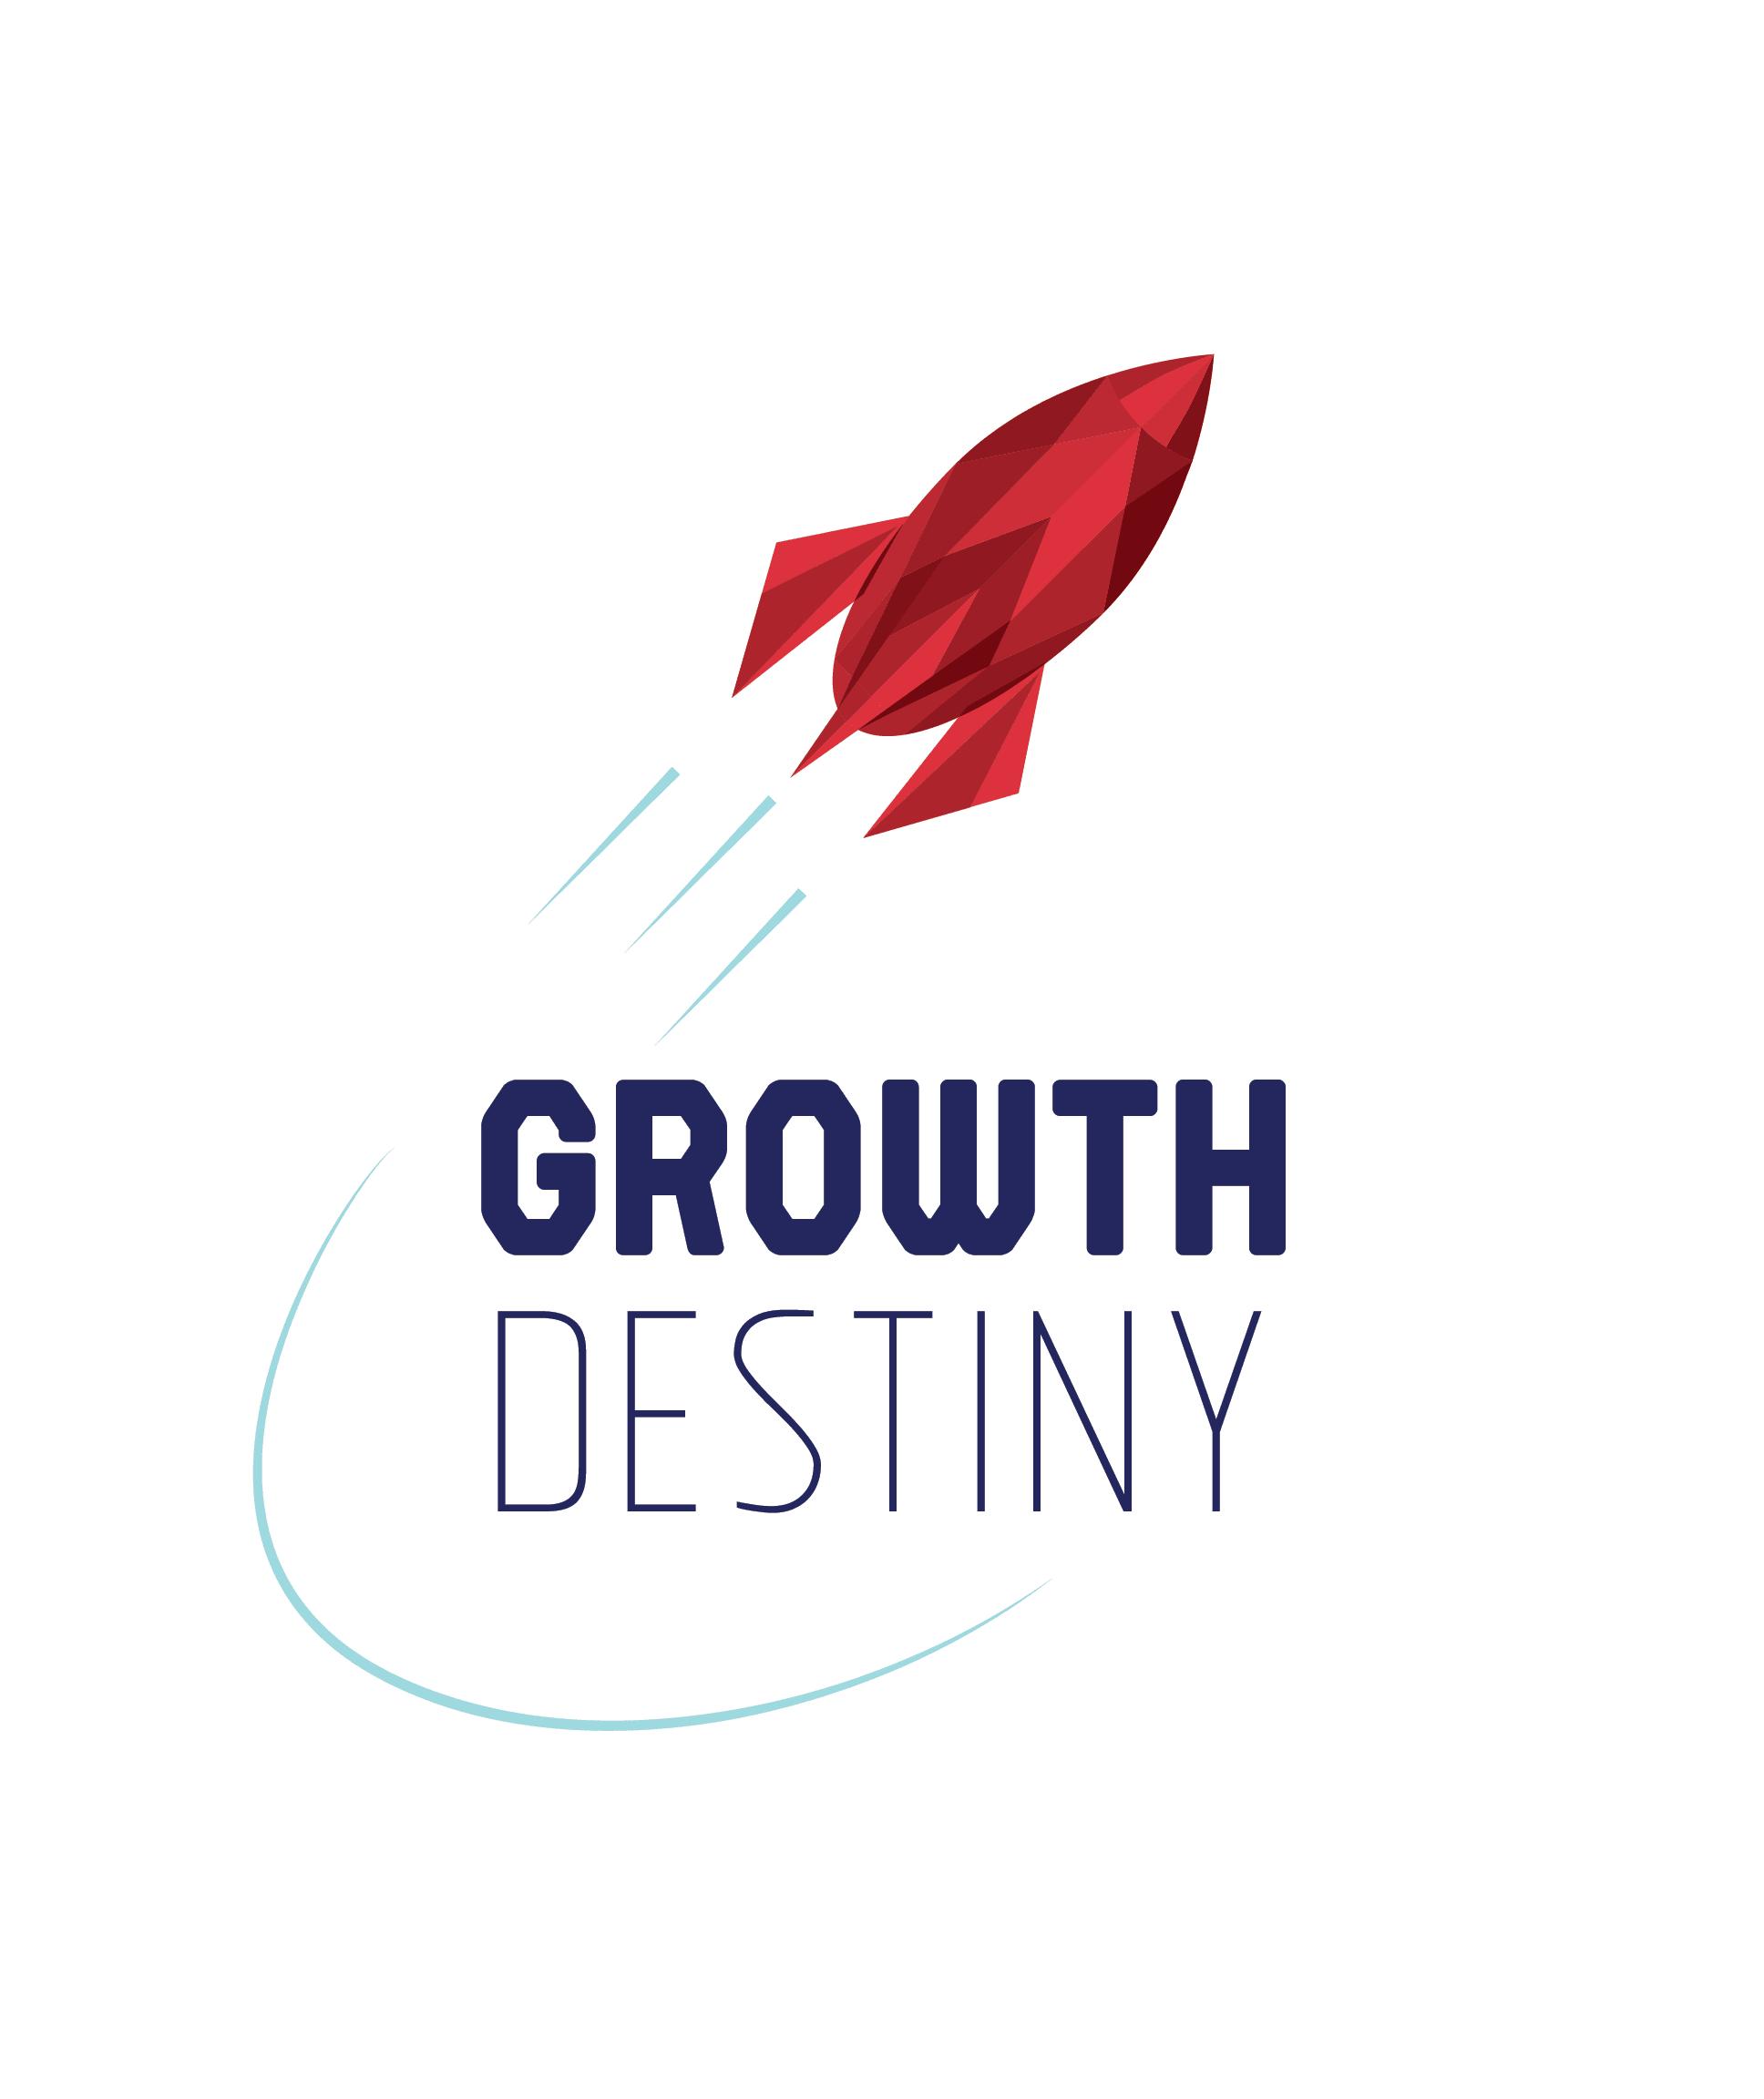 Growth Destiny Equity icon